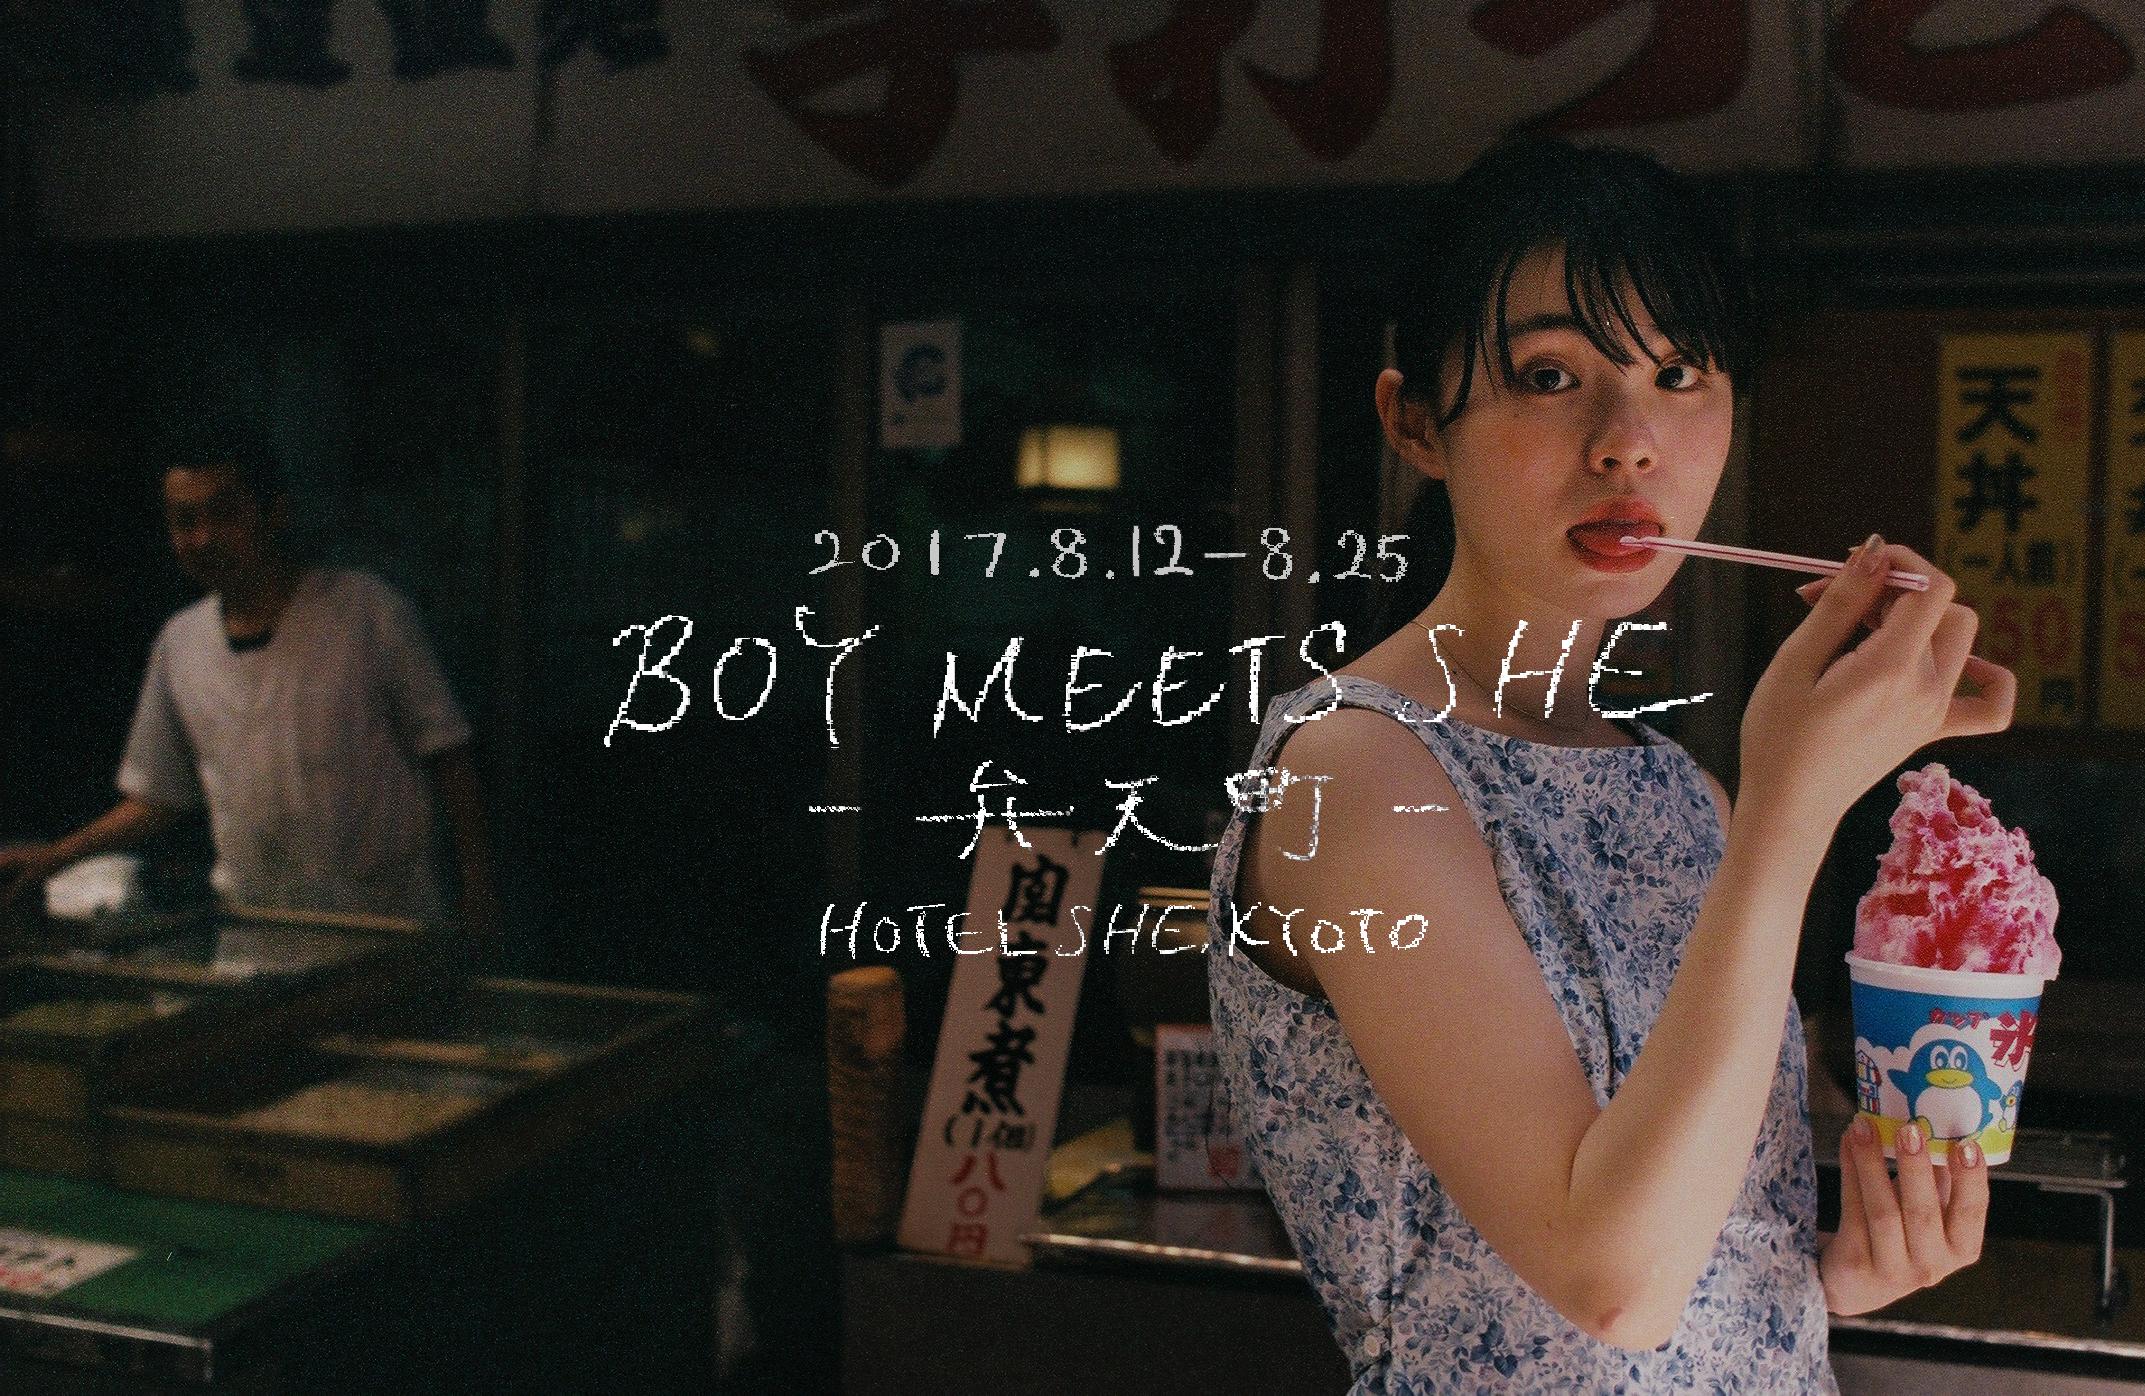 BOY MEETS SHE, / 延原優樹 x るうこ写真展